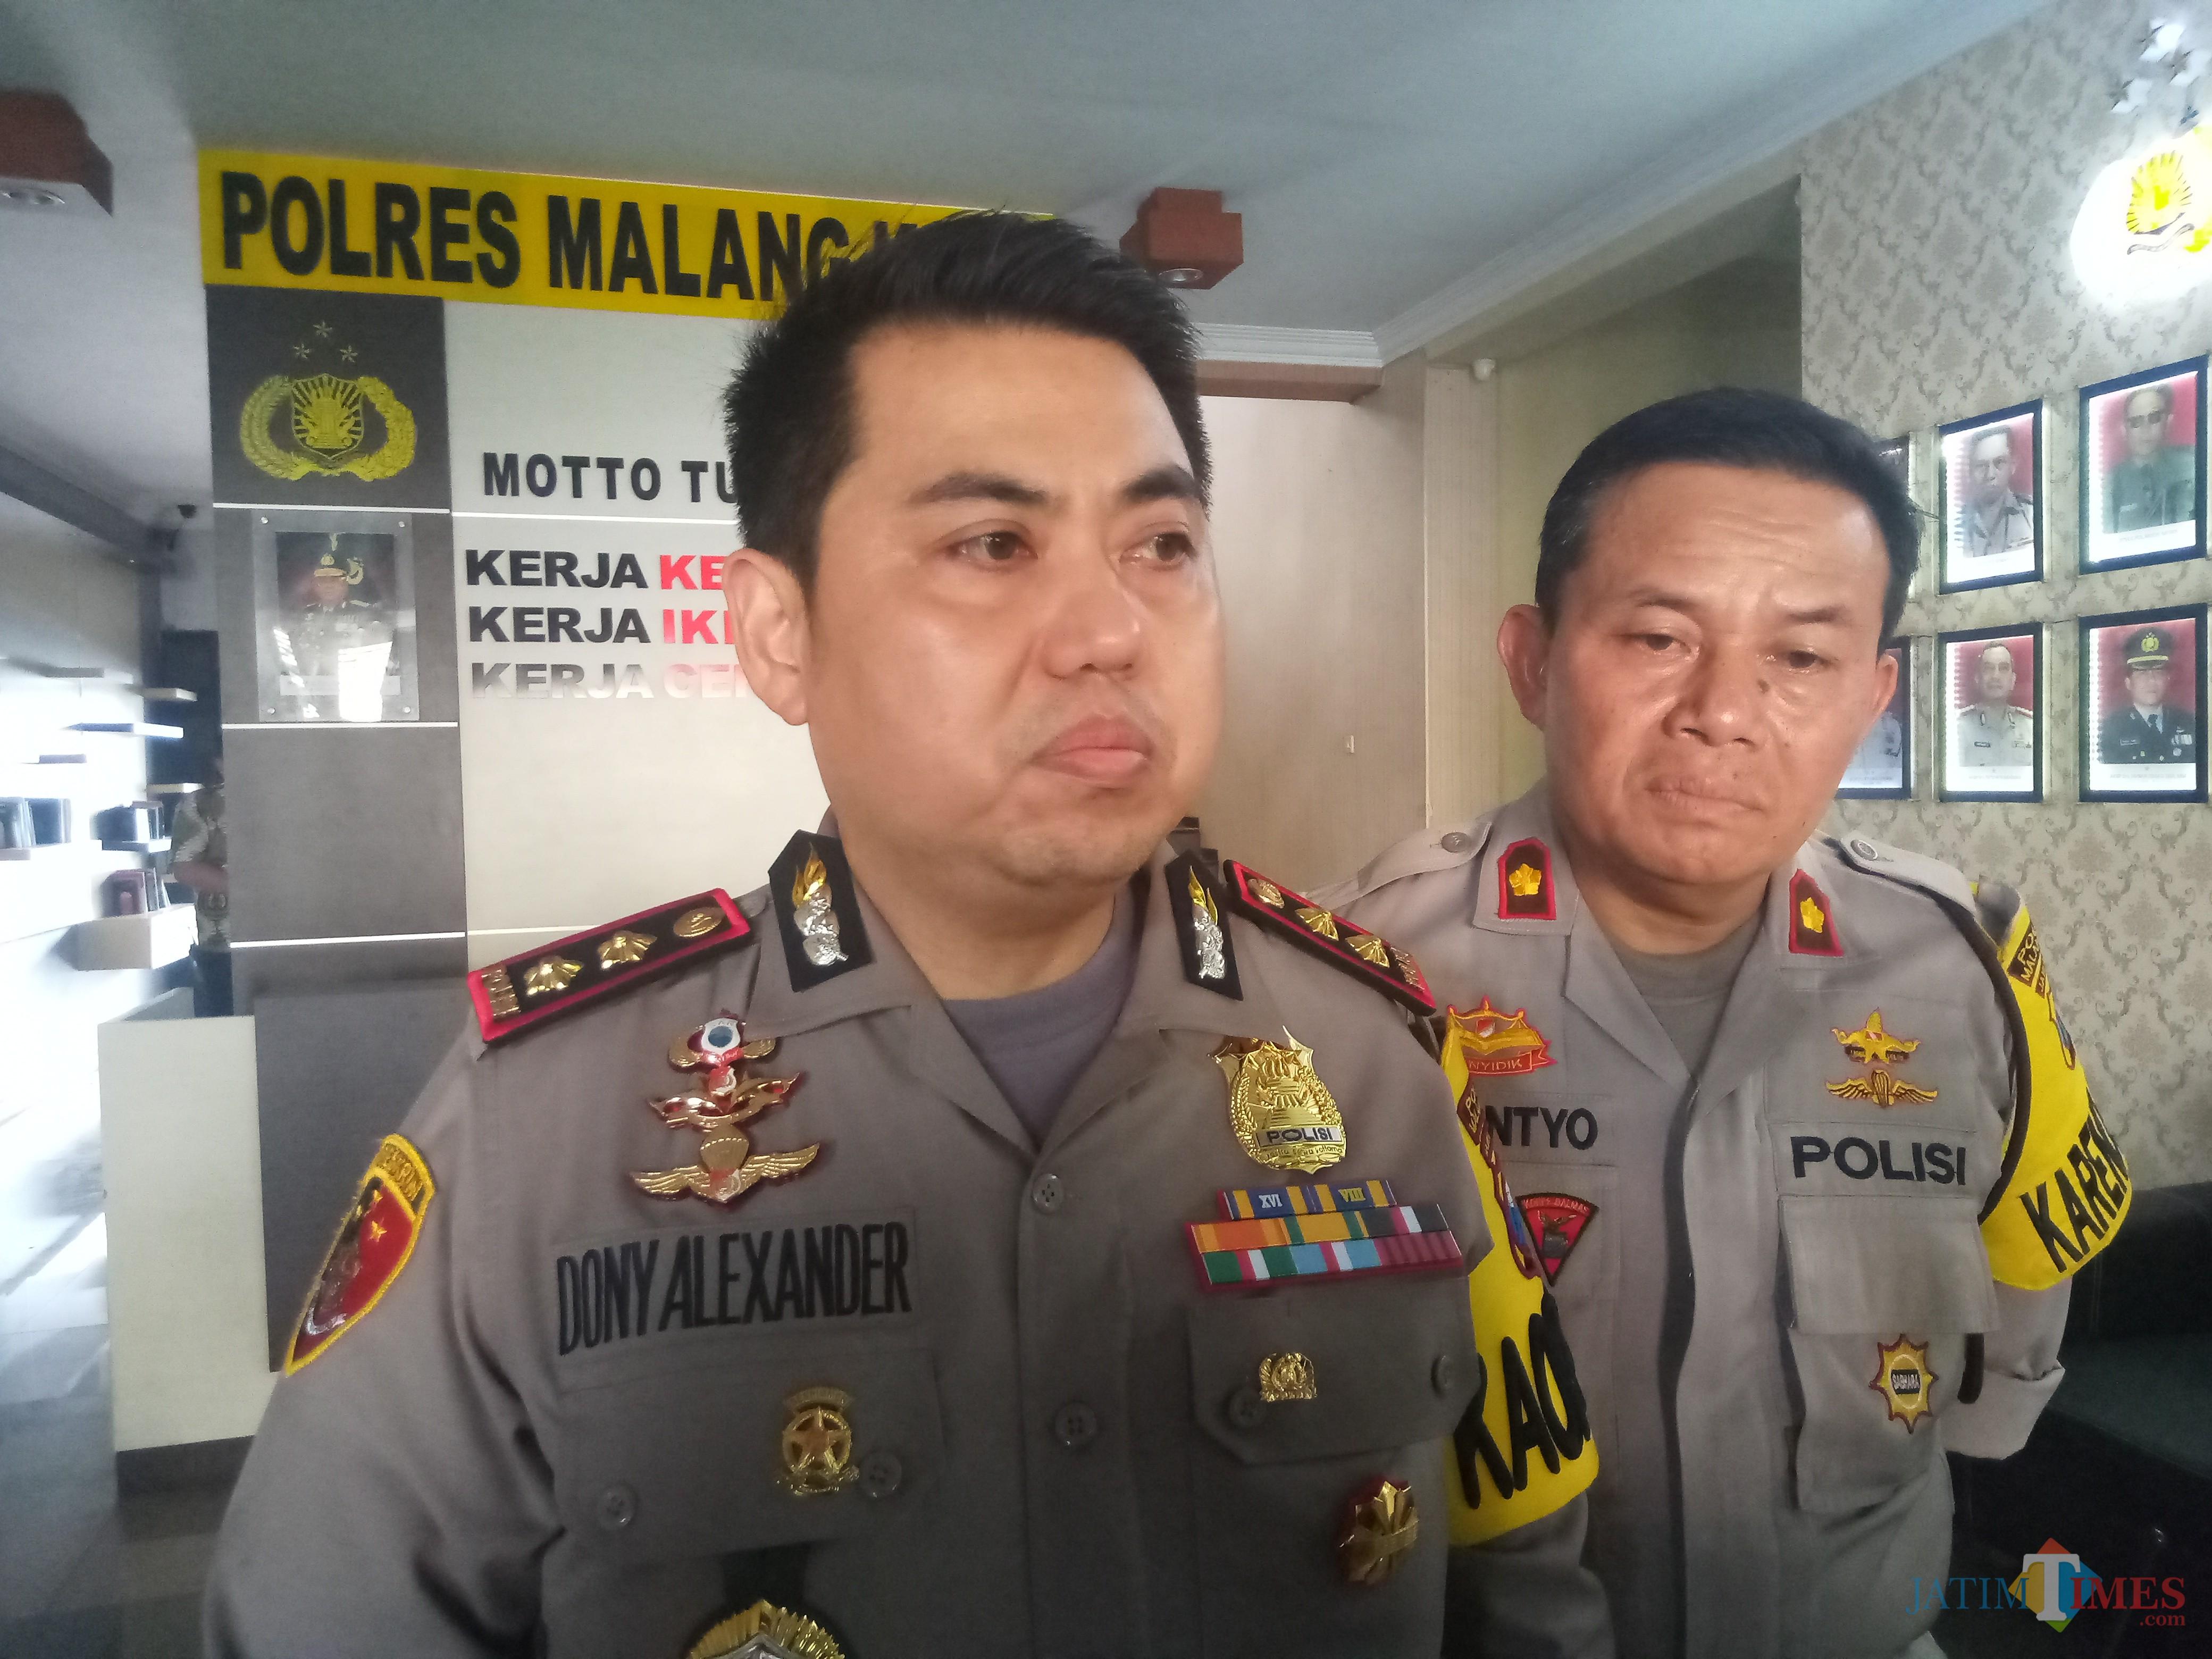 Kapolres Malang Kota AKBP Dony Alexander (Dok. MalangTIMES)